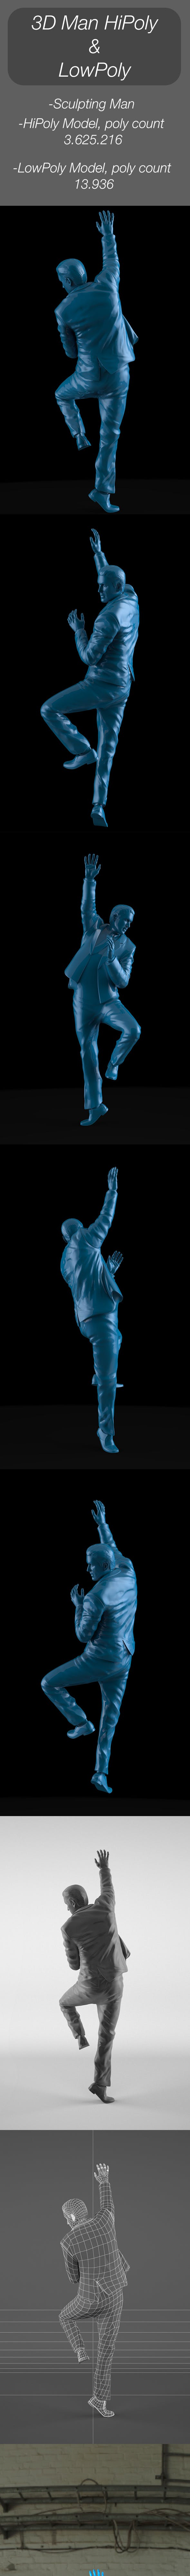 3D Sculpting Man - 3DOcean Item for Sale